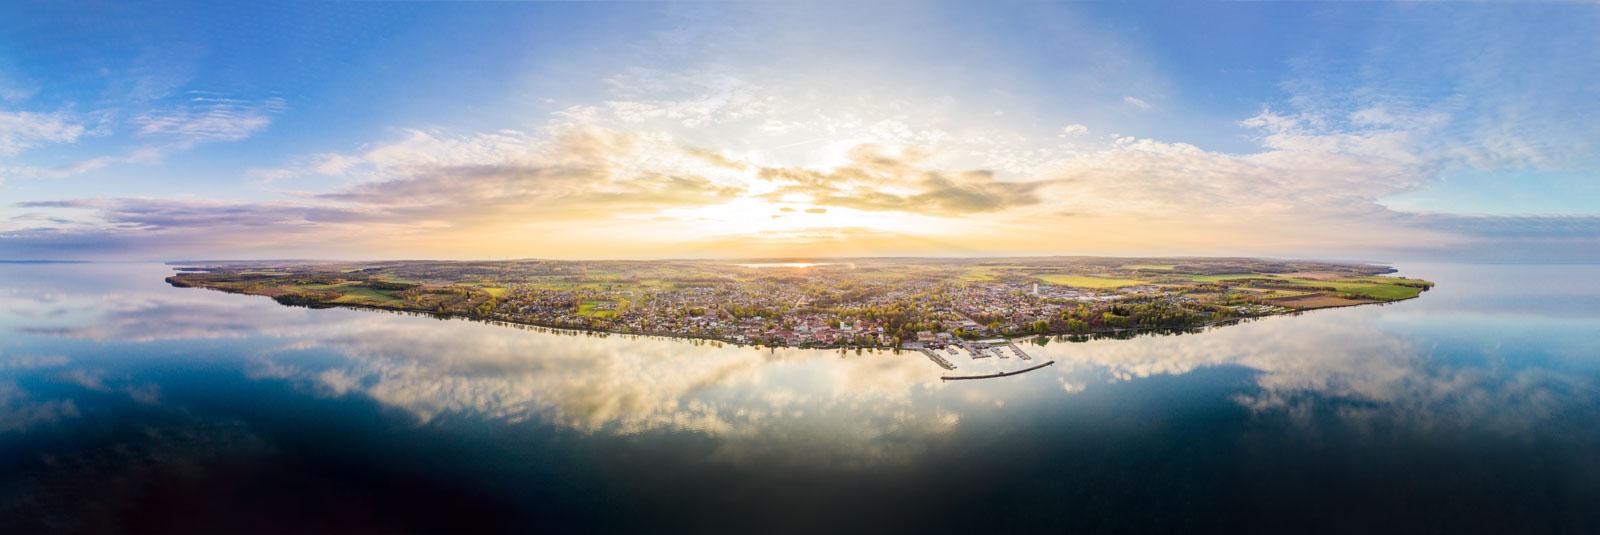 aerial-panorama-hjo-lake-vattern-sweden